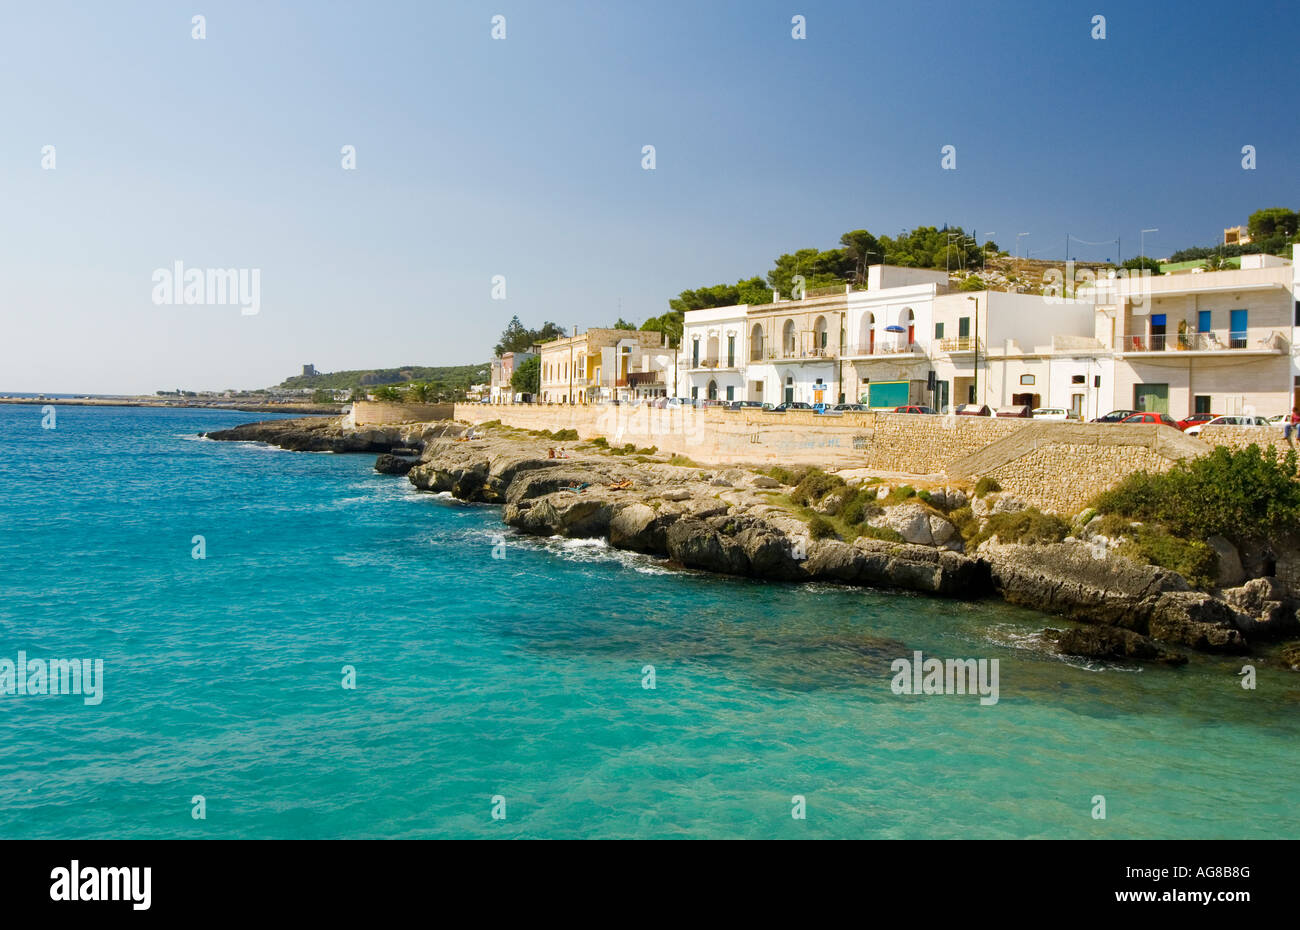 https://c8.alamy.com/compde/ag8b8g/santa-maria-al-bagno-puglia-italien-ag8b8g.jpg